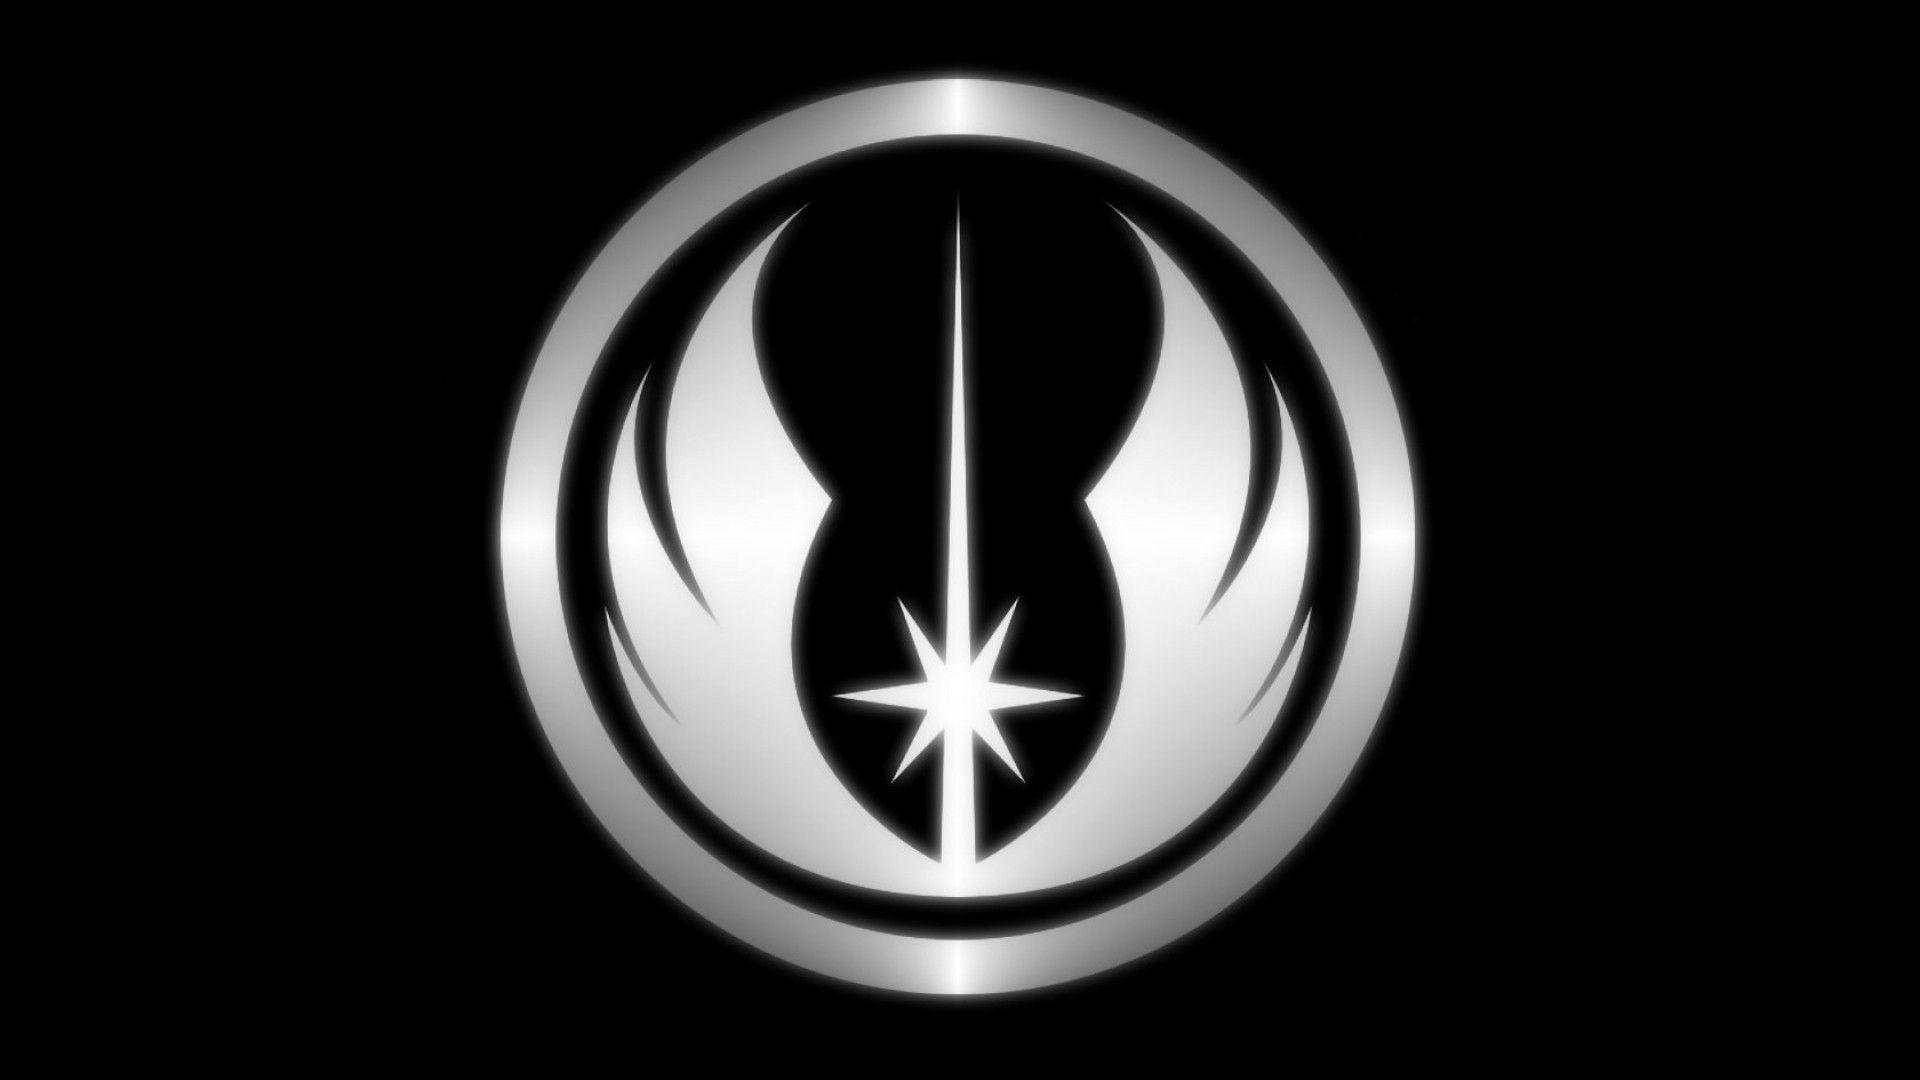 Logos For > Star Wars Republic Logo Wallpaper